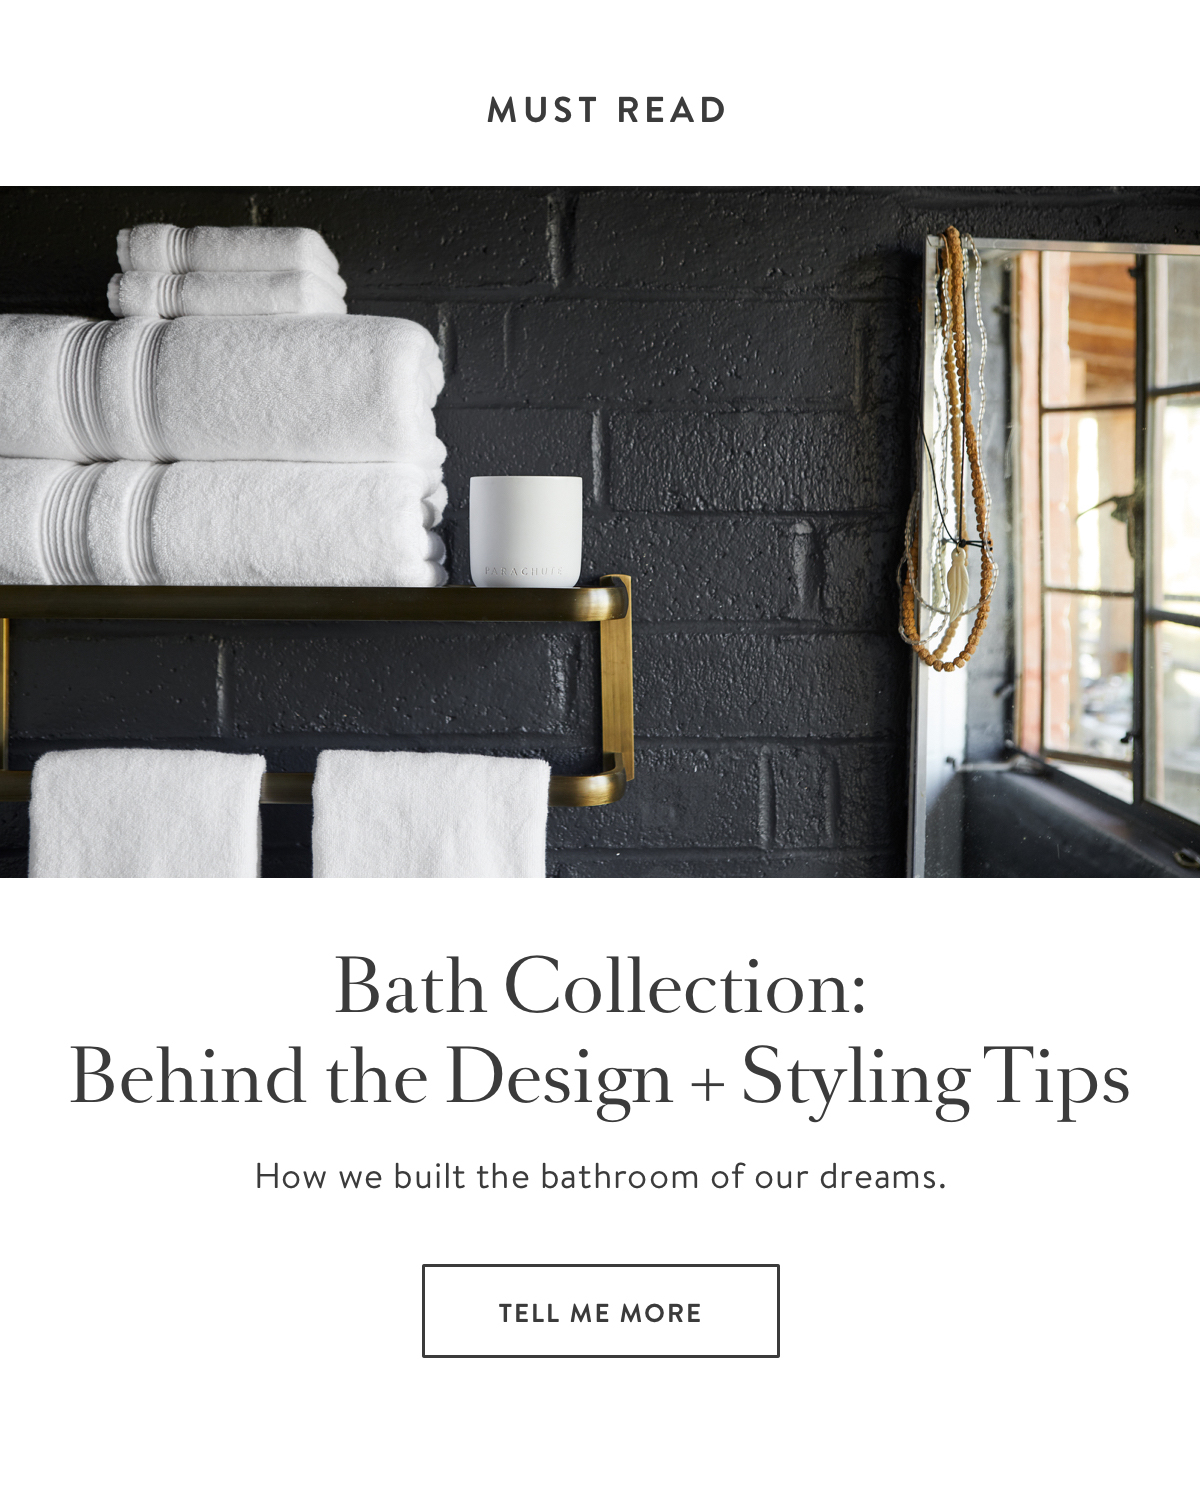 Bath Collection Blog Story